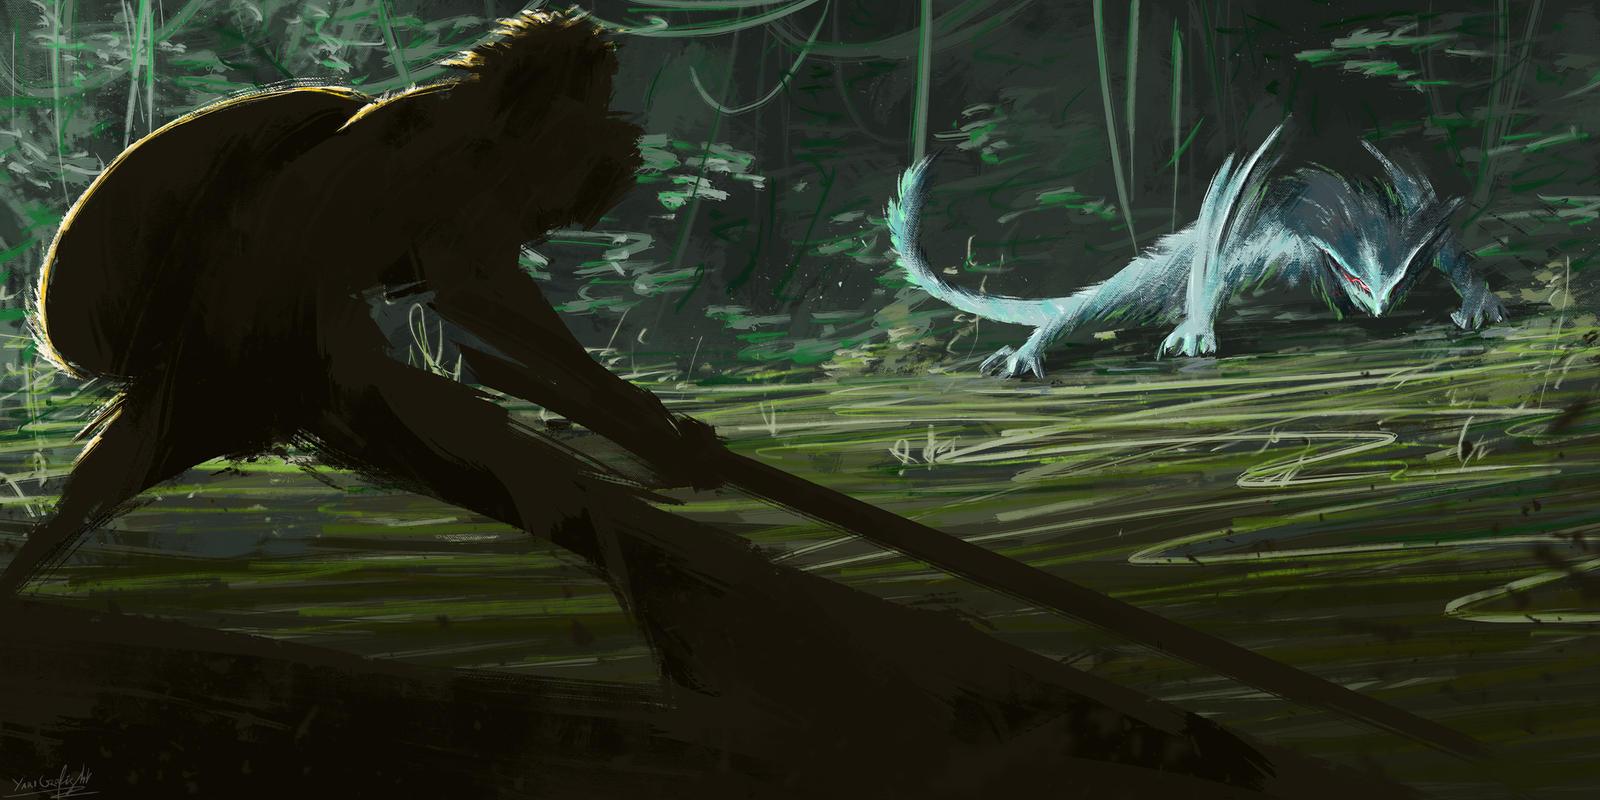 Teaser - 00 - The Pillar's Beast by YariGrafight